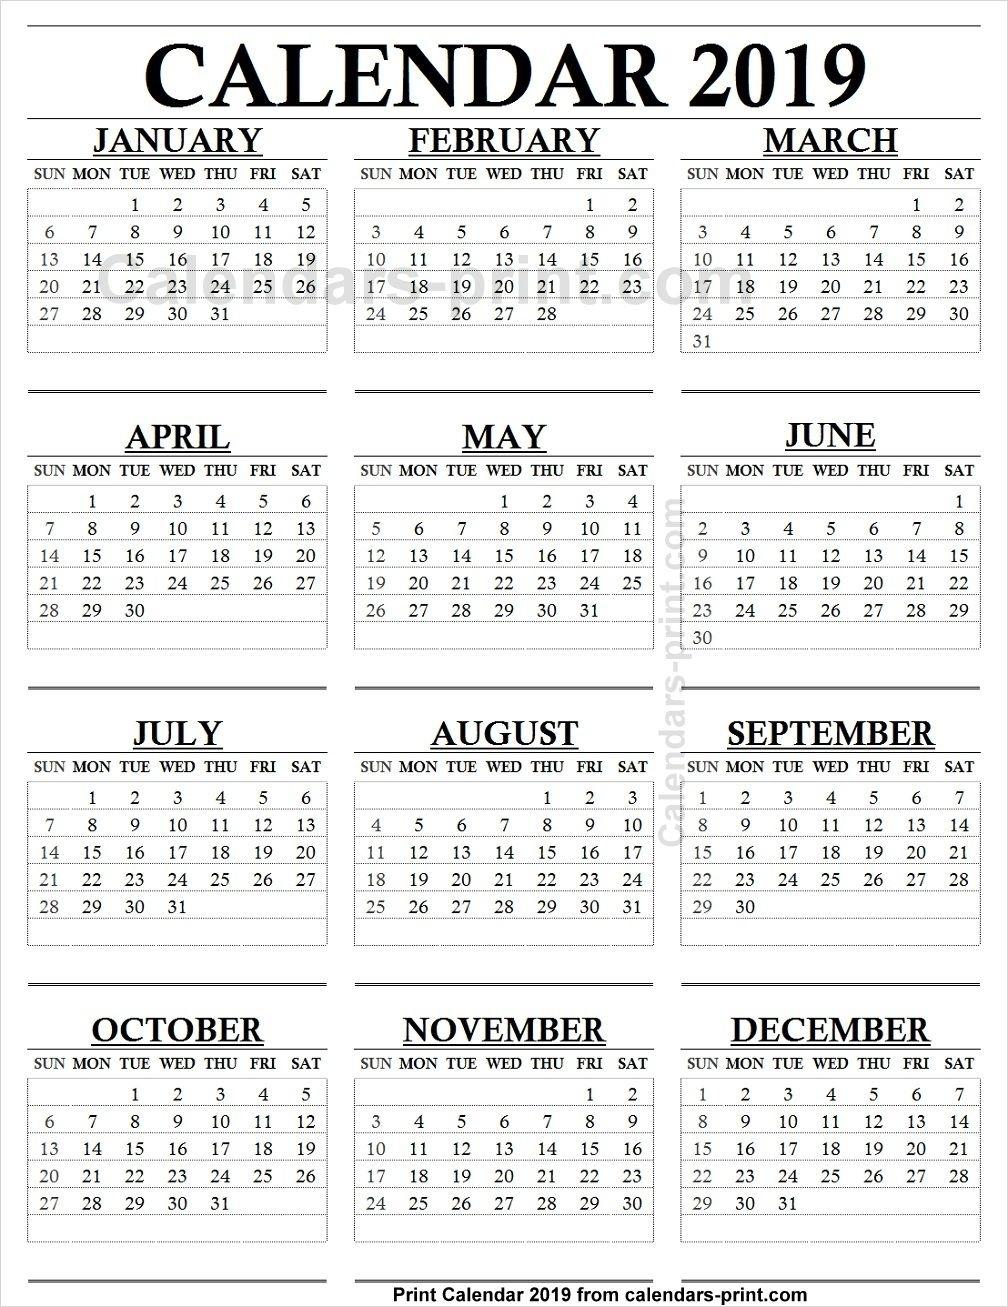 12 Month Calendar Print Out | Calendar Printing Example